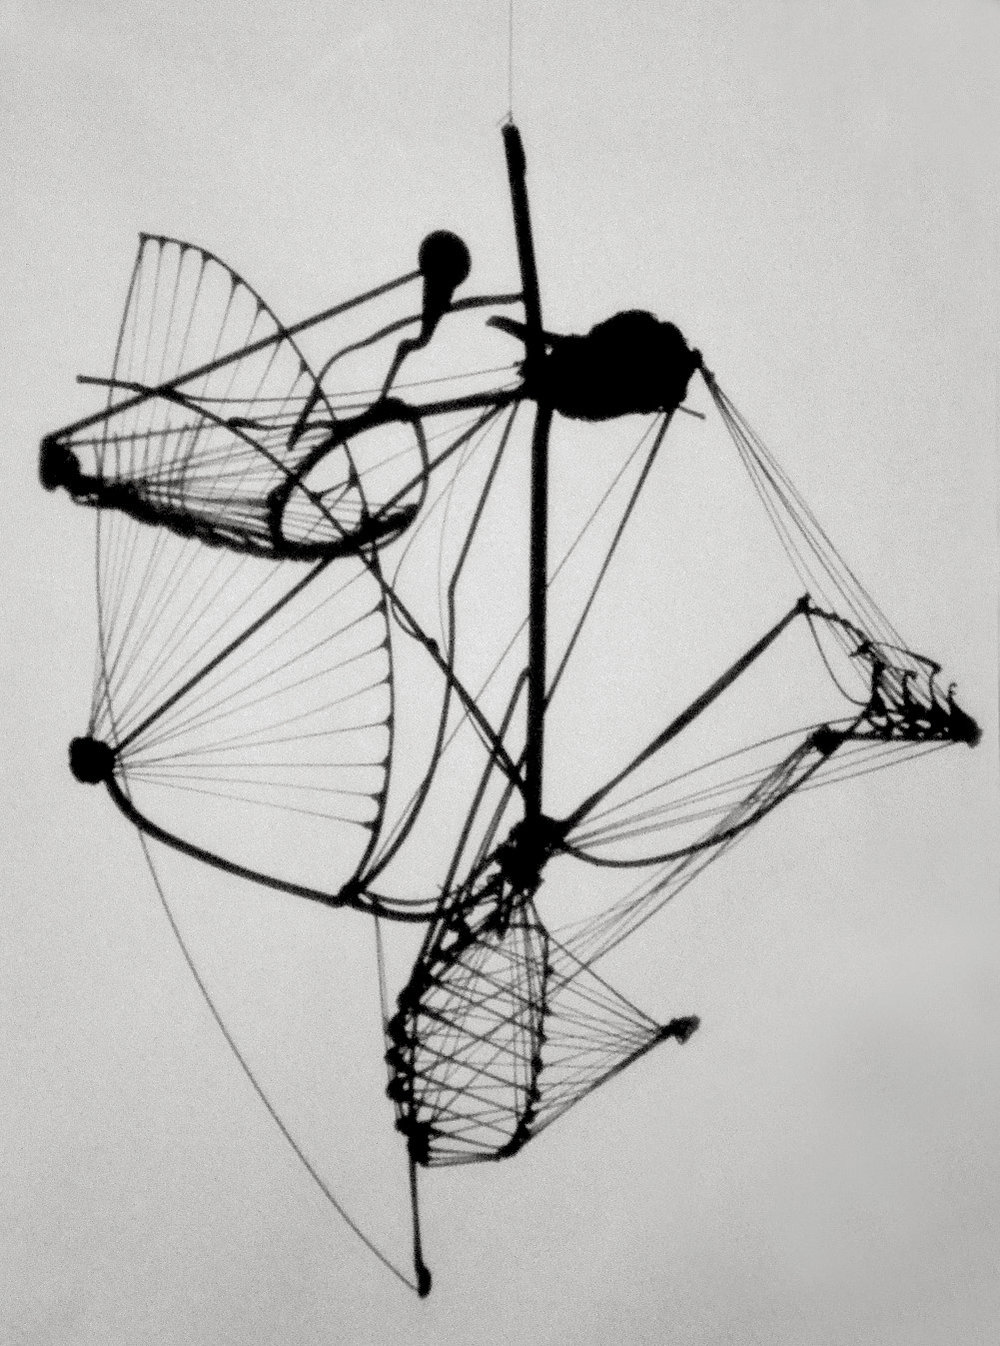 321.2.SEM TÍTULO. Vidro Borosilicato, 60 x 60 x 50 cm, 2014.:UNTITLED. Borosilicate Glass, 60 x 60 x 50 cm (23.62 x 23.62 x 19.68 in), 2014.jpg